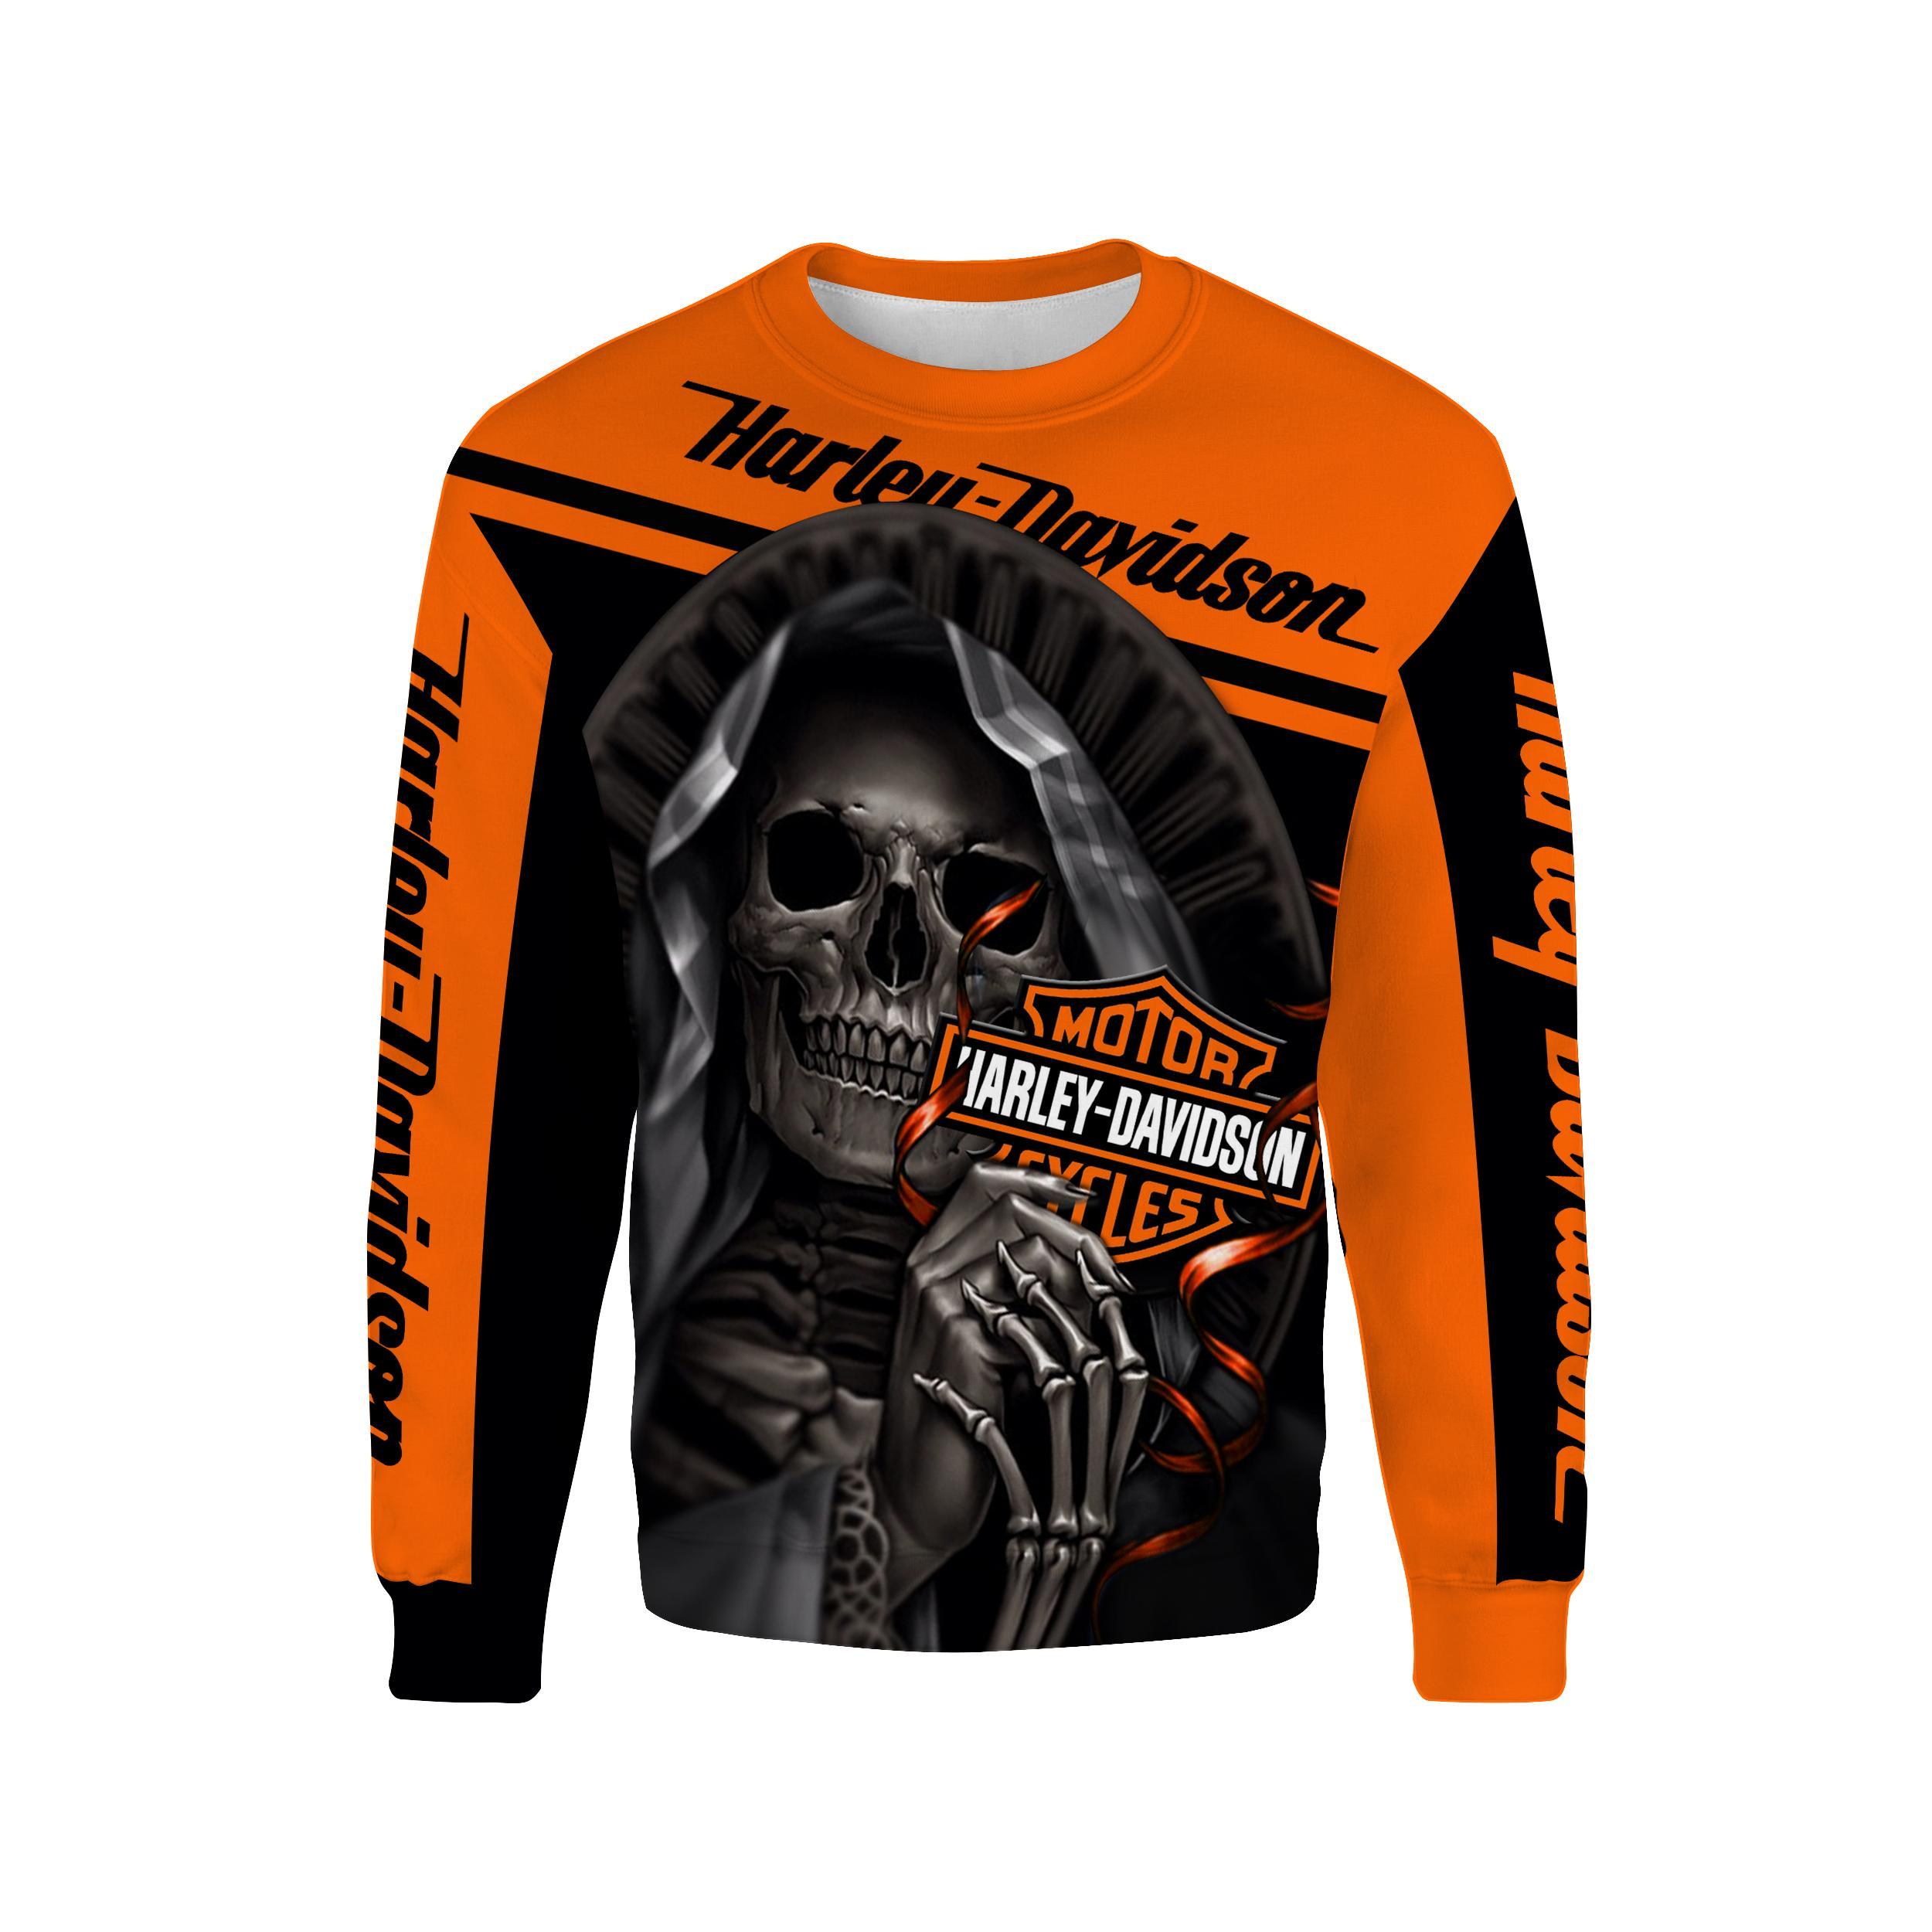 Harley-Davidson Motorcycle Skull 3D Full Over Print shirt sweatshirt